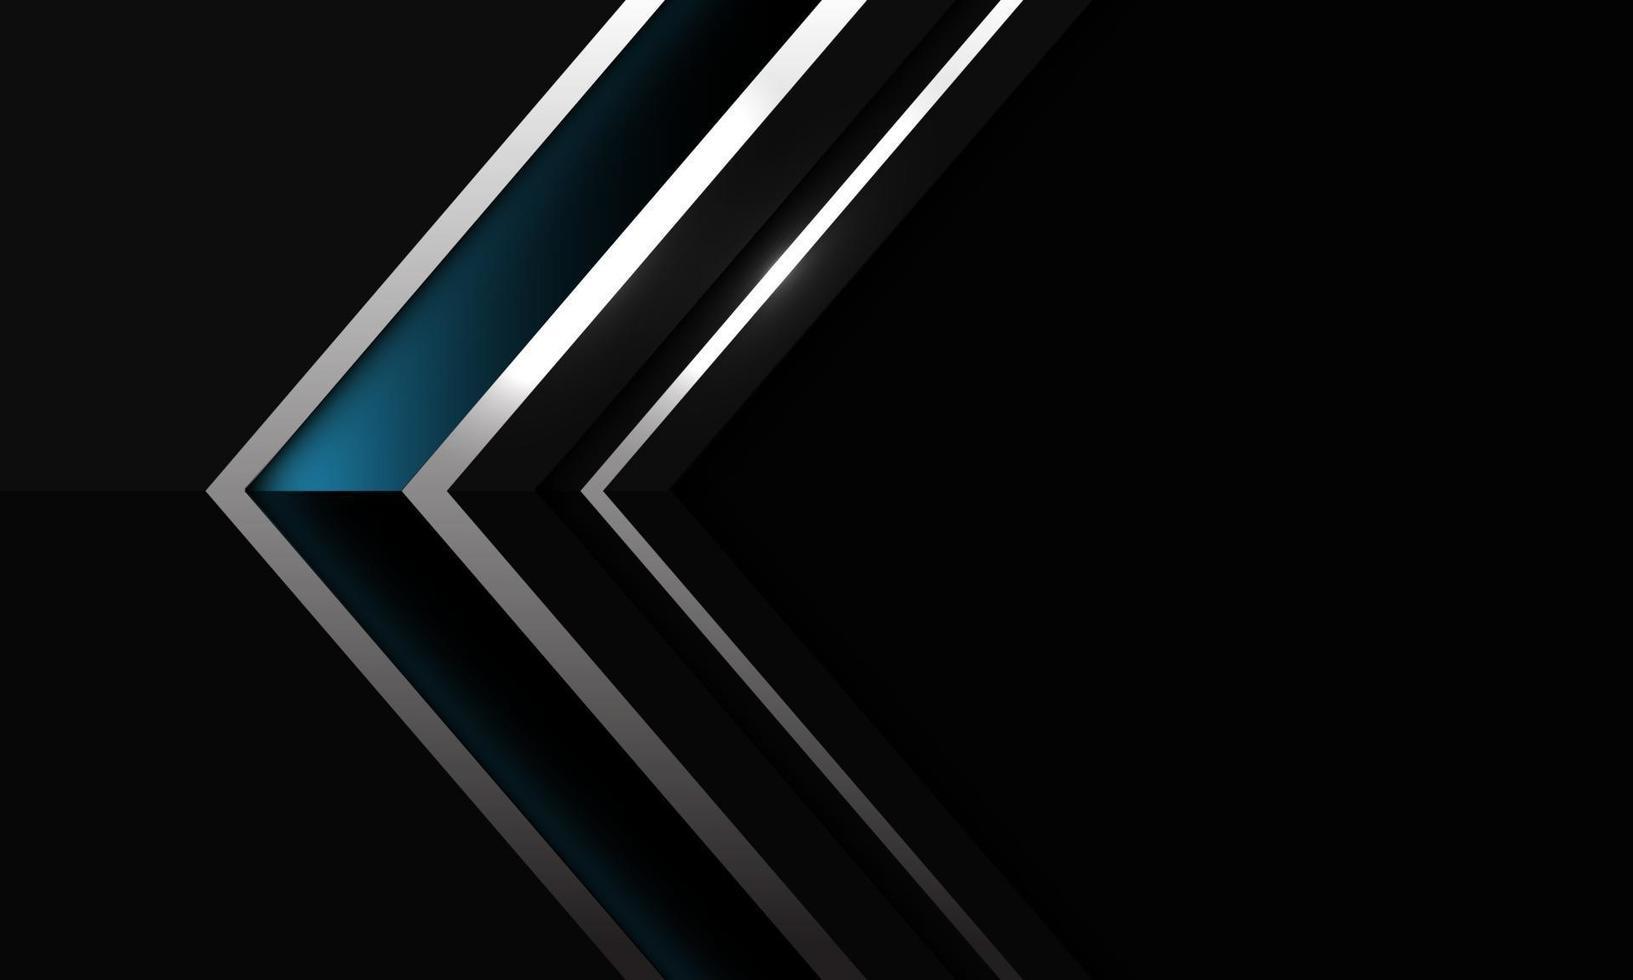 abstrakt mörkblå blank silverlinje pil skuggriktning på svart med tomt utrymme design modern futuristisk bakgrundsvektorillustration. vektor